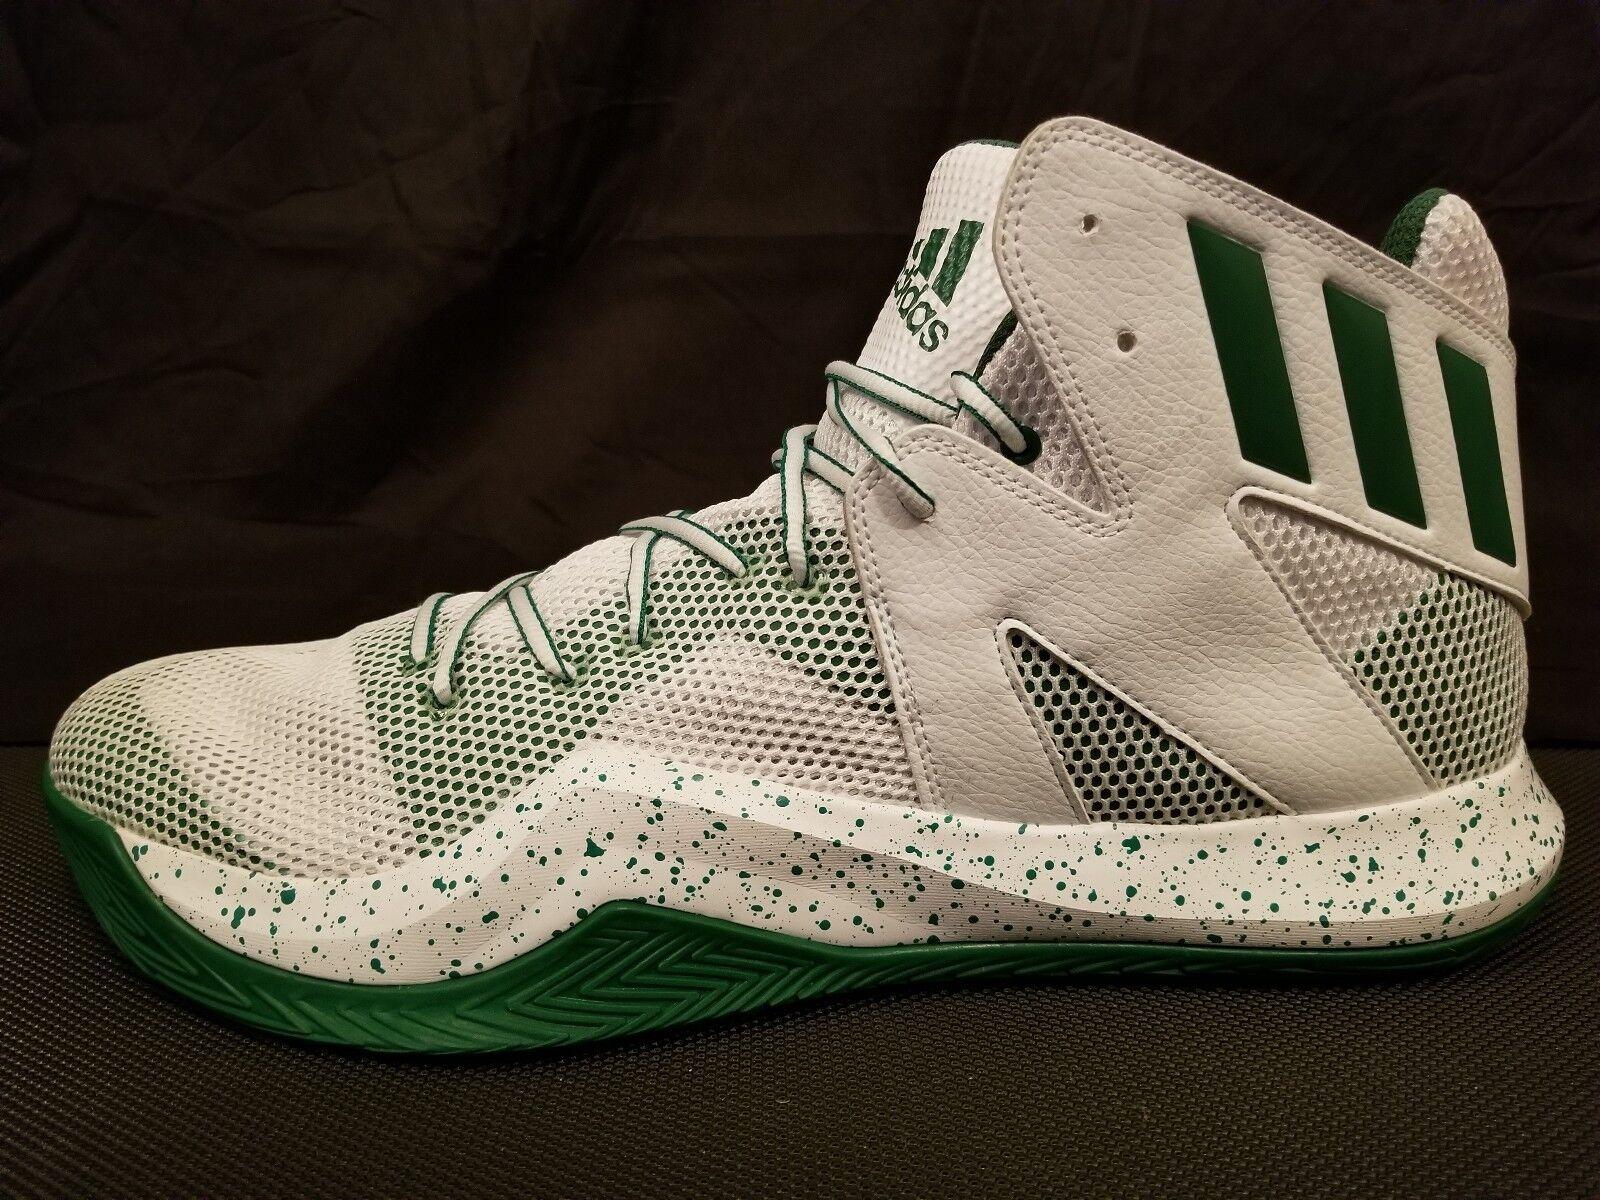 Adidas Black Performance Crazy Bounce Basketball Shoe for men